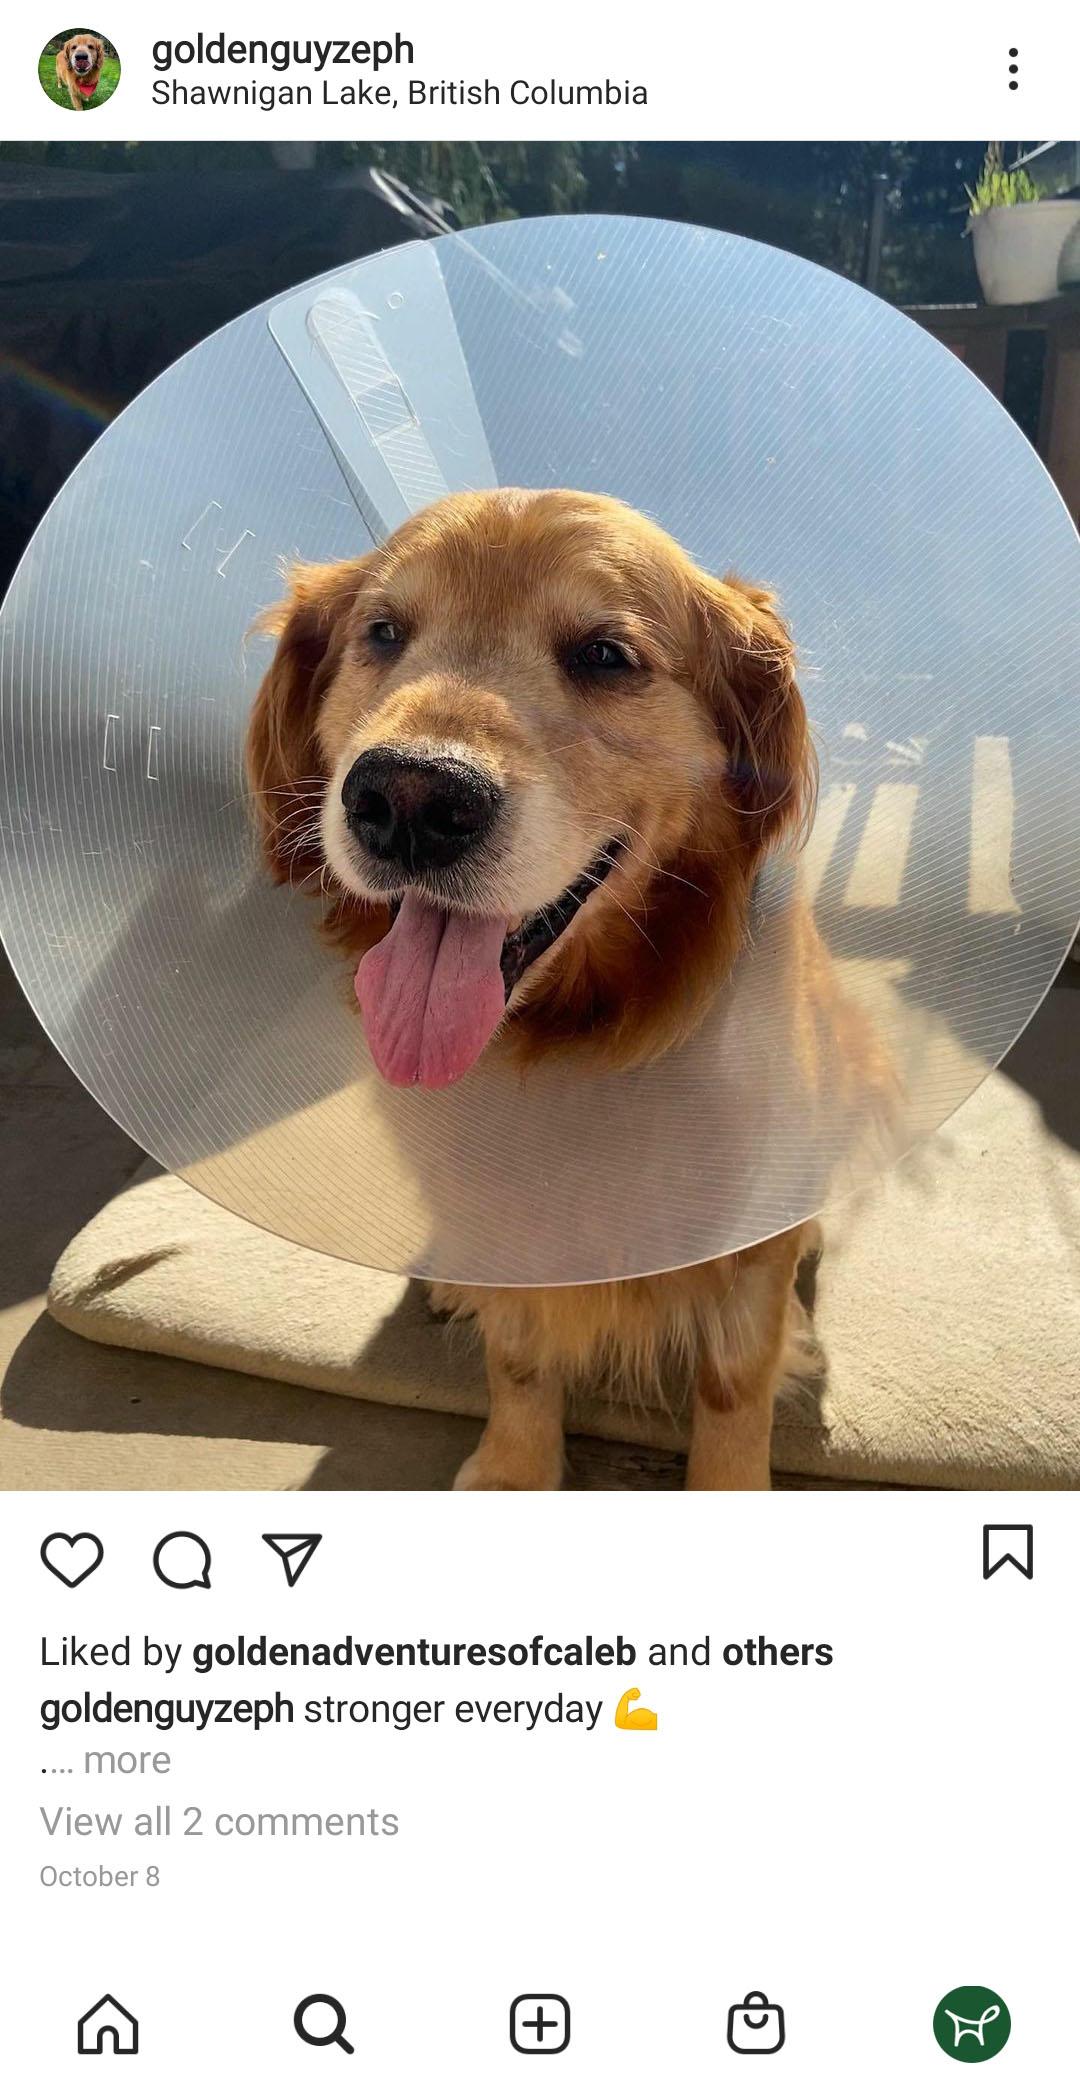 A dog wearing elizabet collar